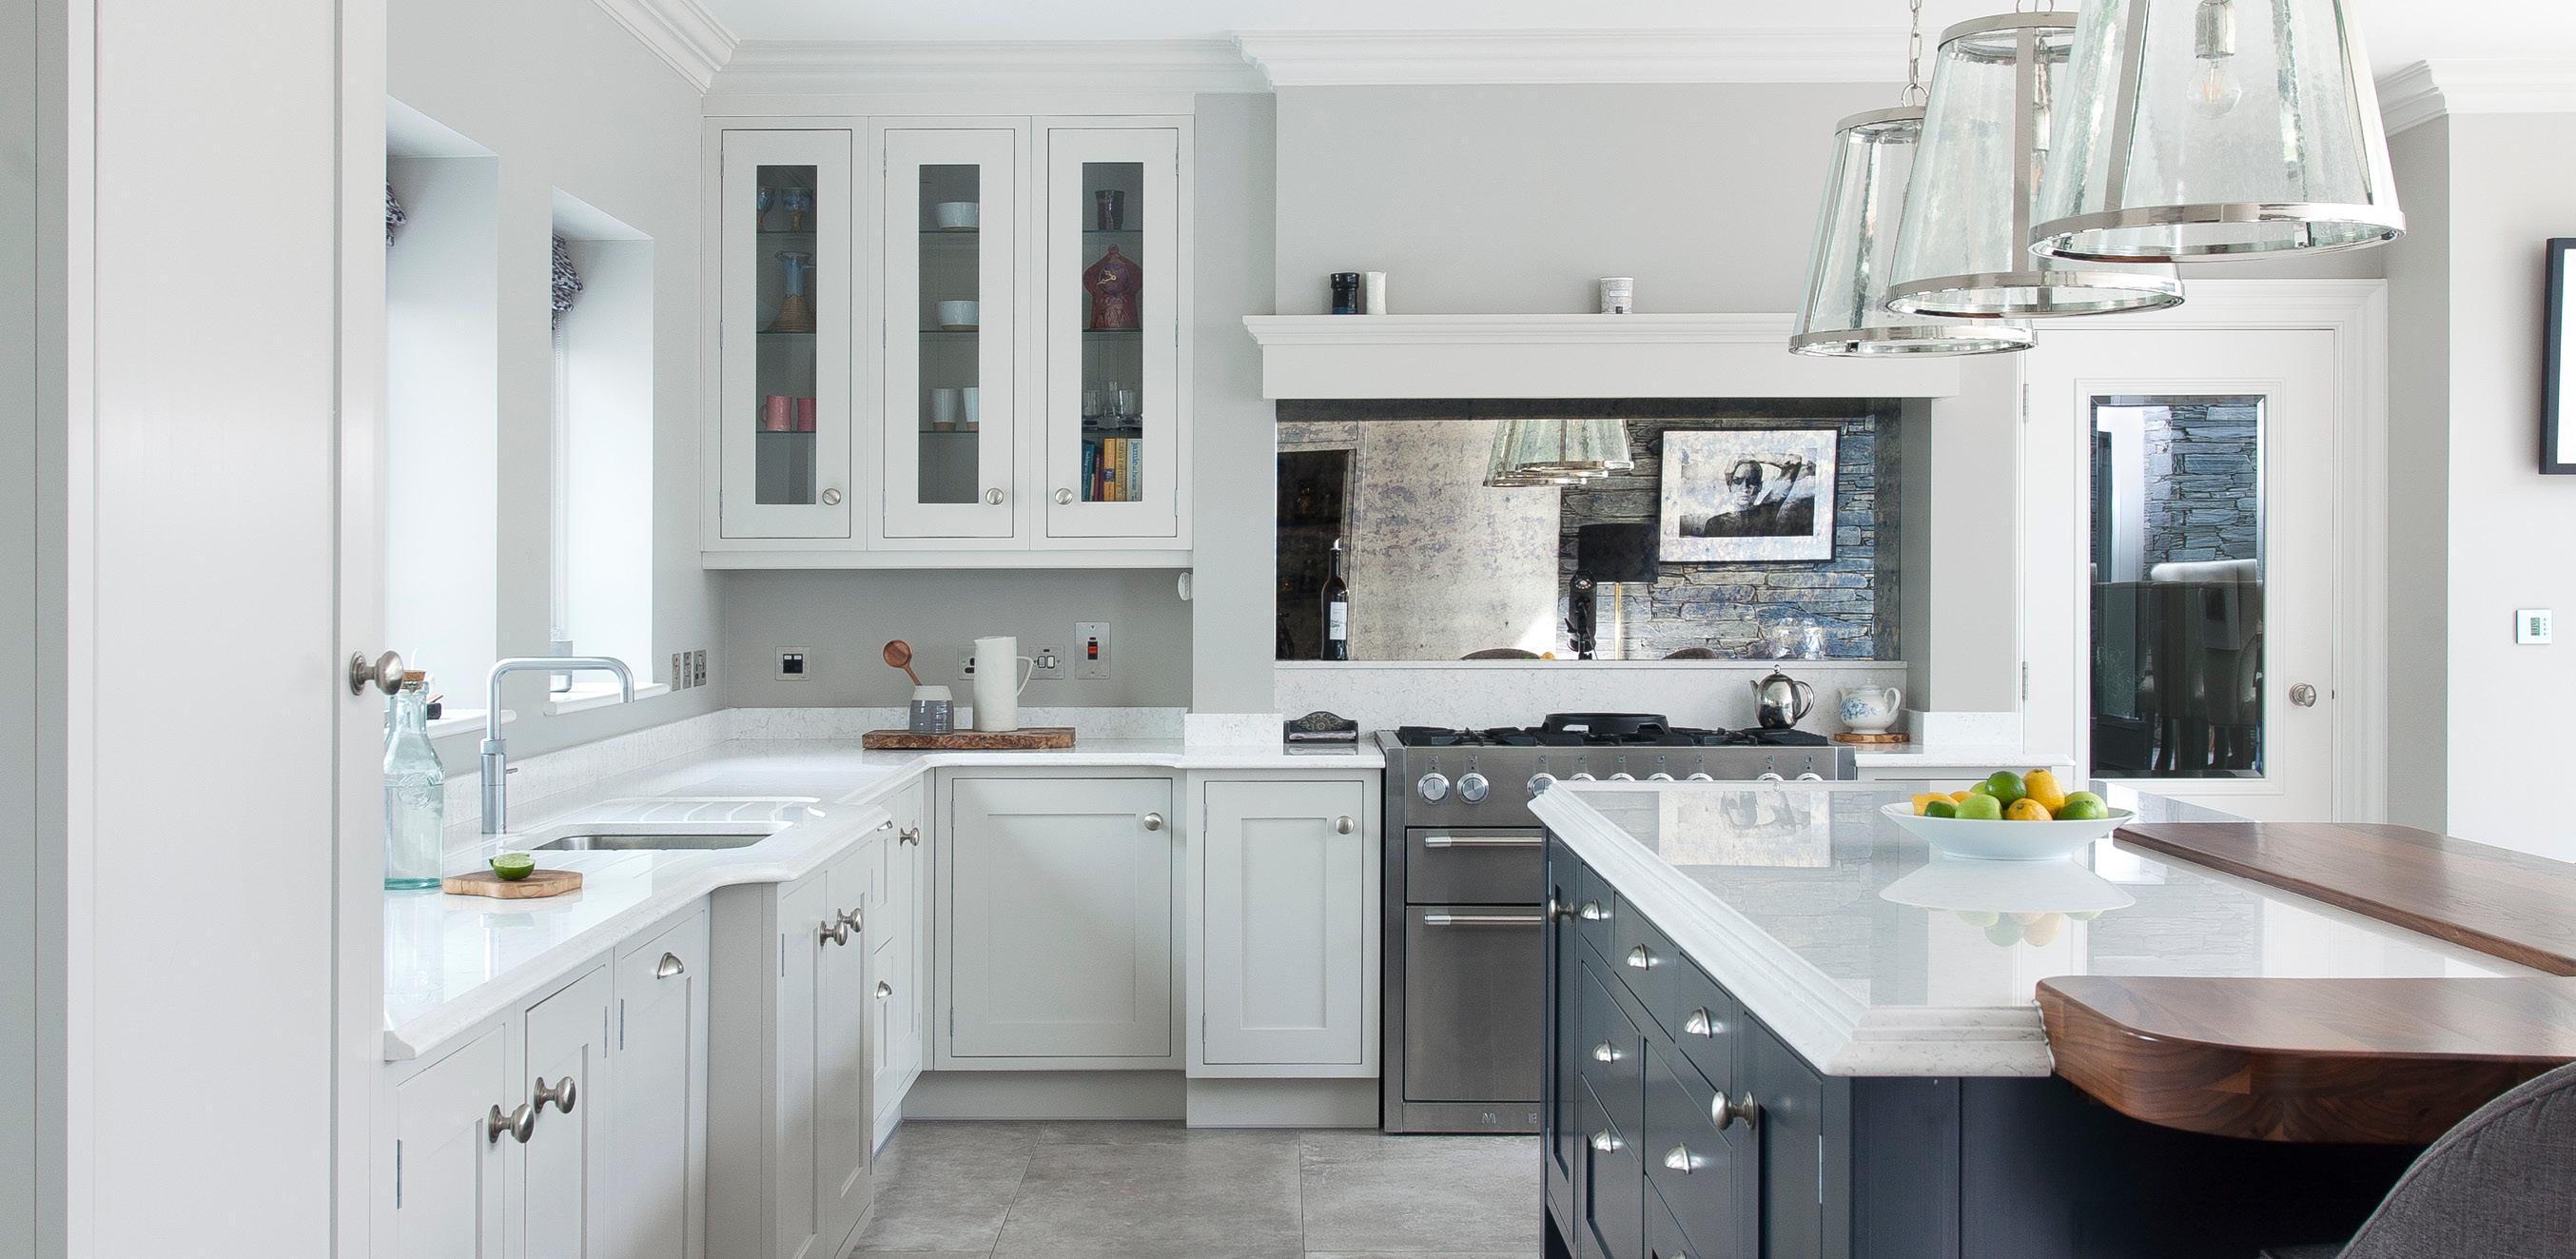 Modern Classic Kitchen greenhill kitchens, county tyrone, northern ireland » modern